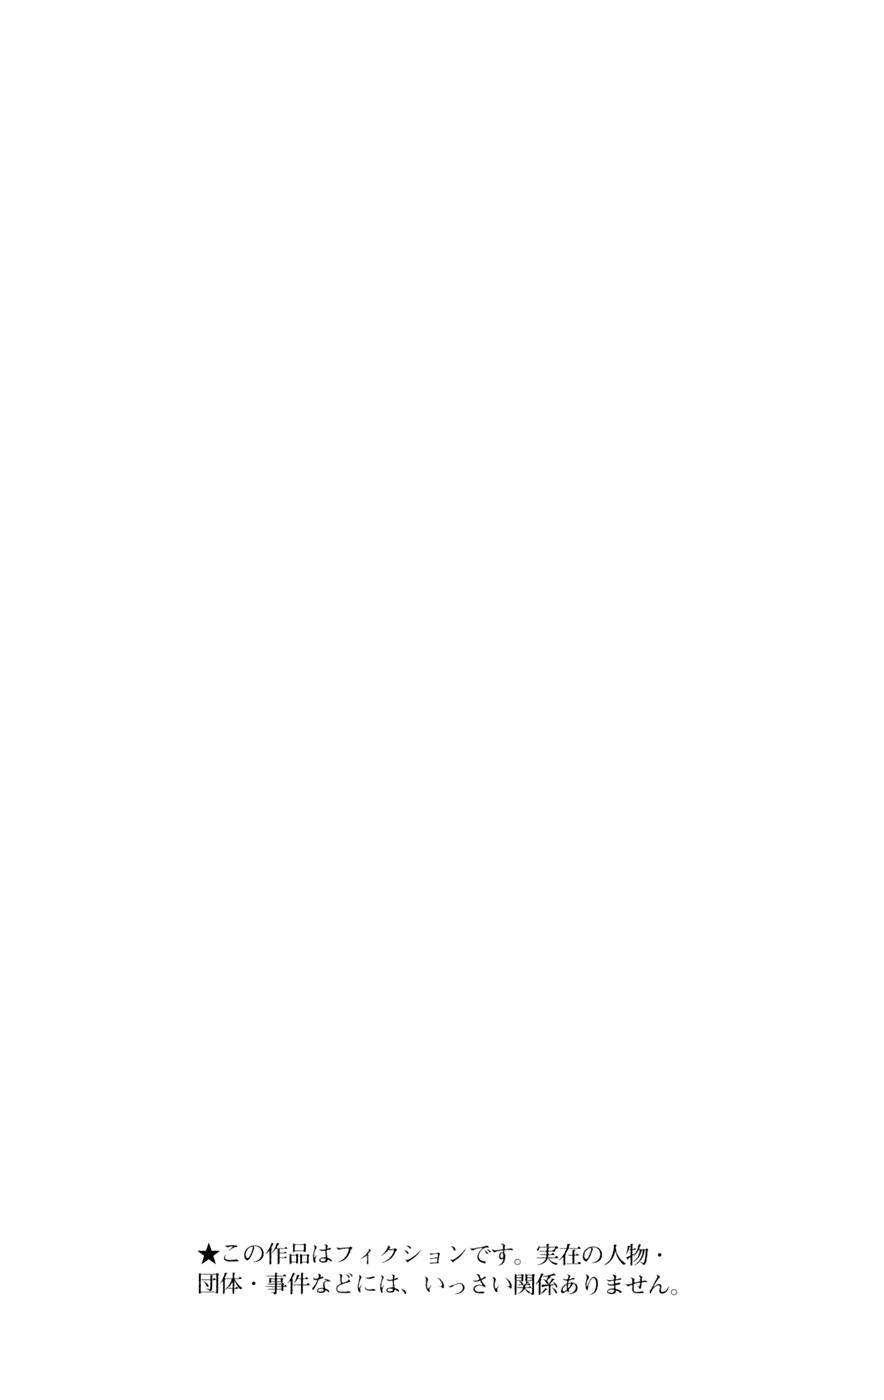 Манга Любовные неприятности / To Love-Ru  - Том 18 Глава 153 Страница 8